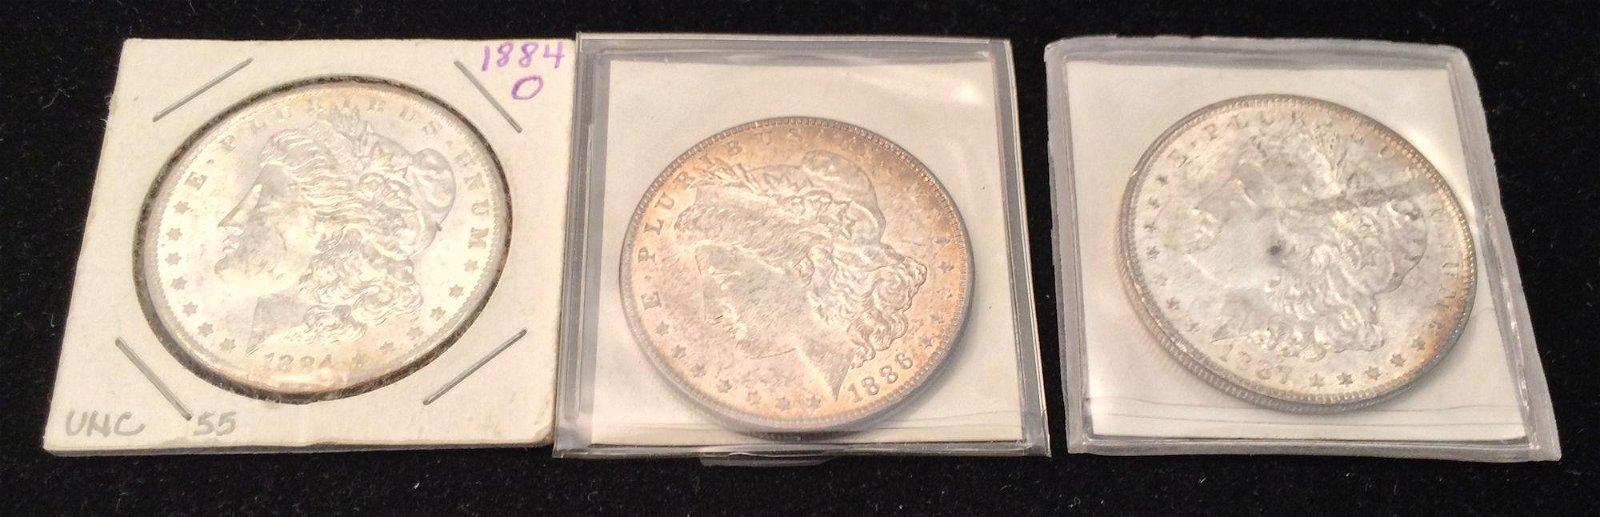 3 MORGAN SILVER DOLLARS INCLUDING 1884O, 1886, AND 1887